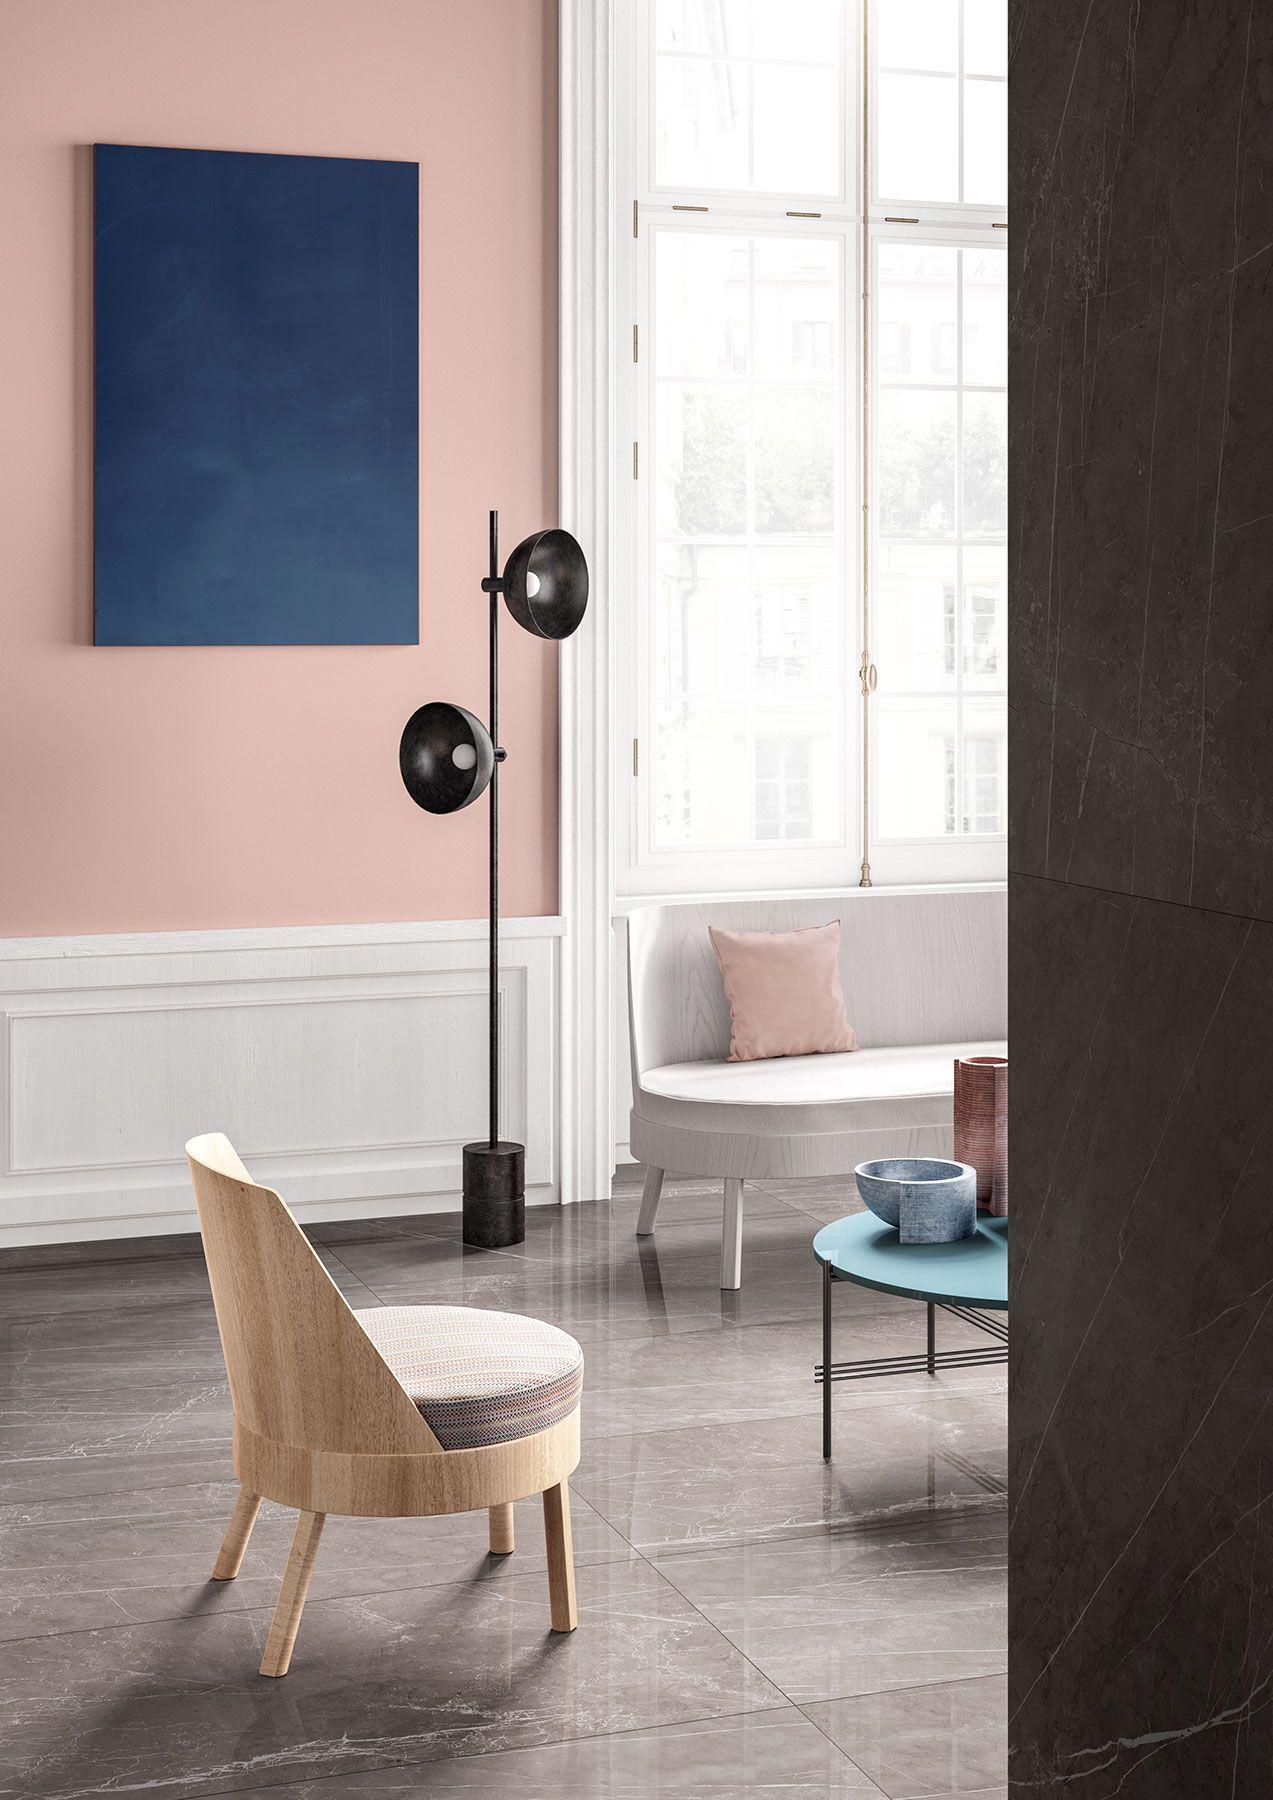 terzo piano interior interior interior design design rh pinterest com